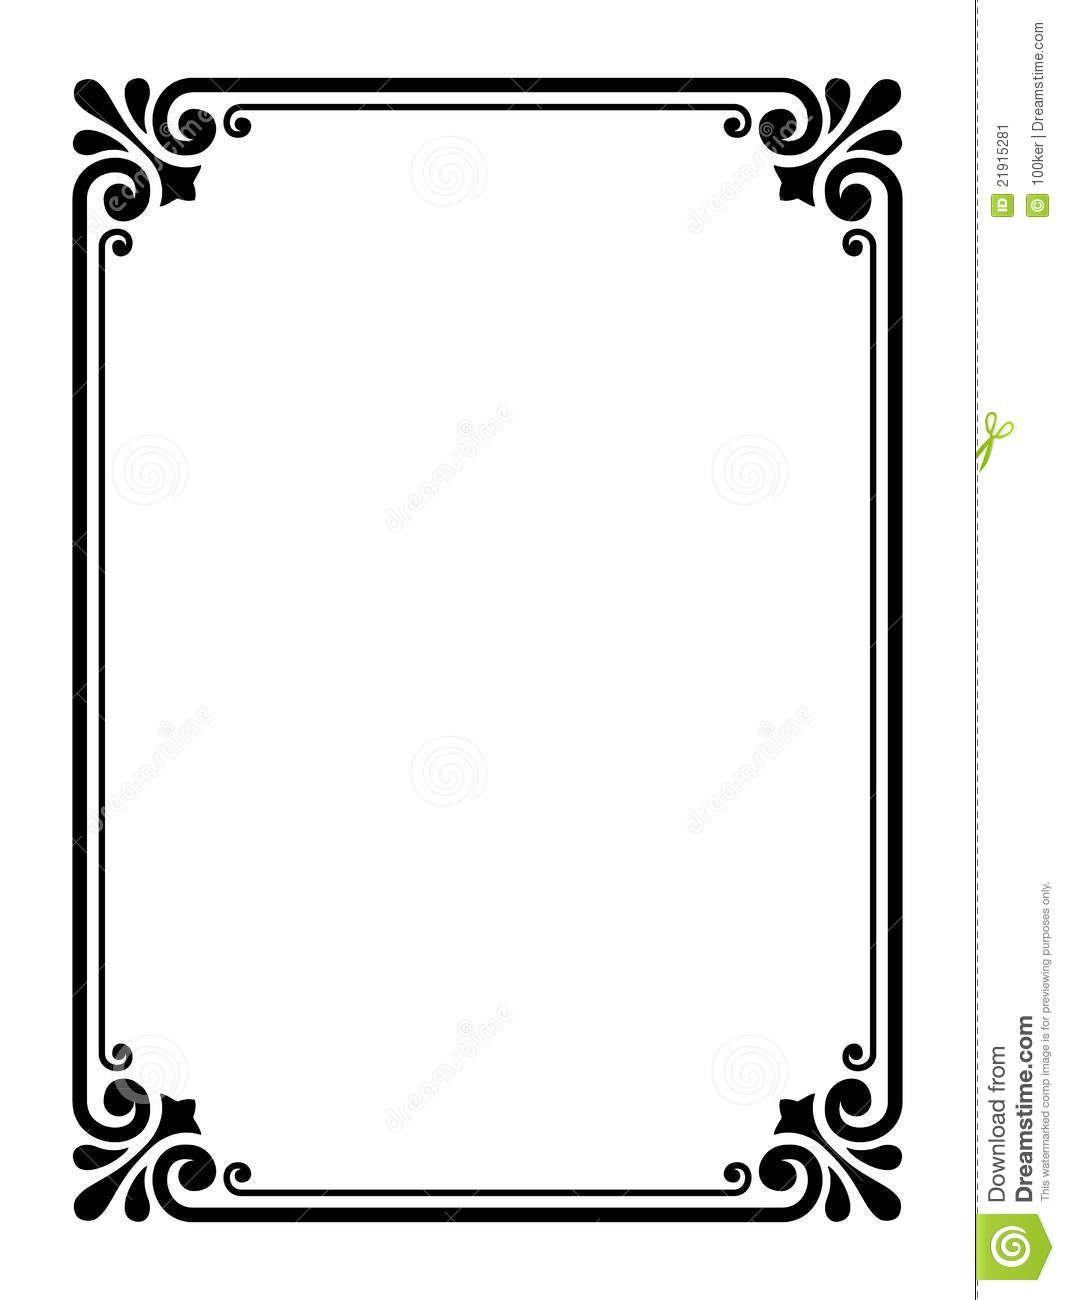 1065x1300 Simple Frame Clipart